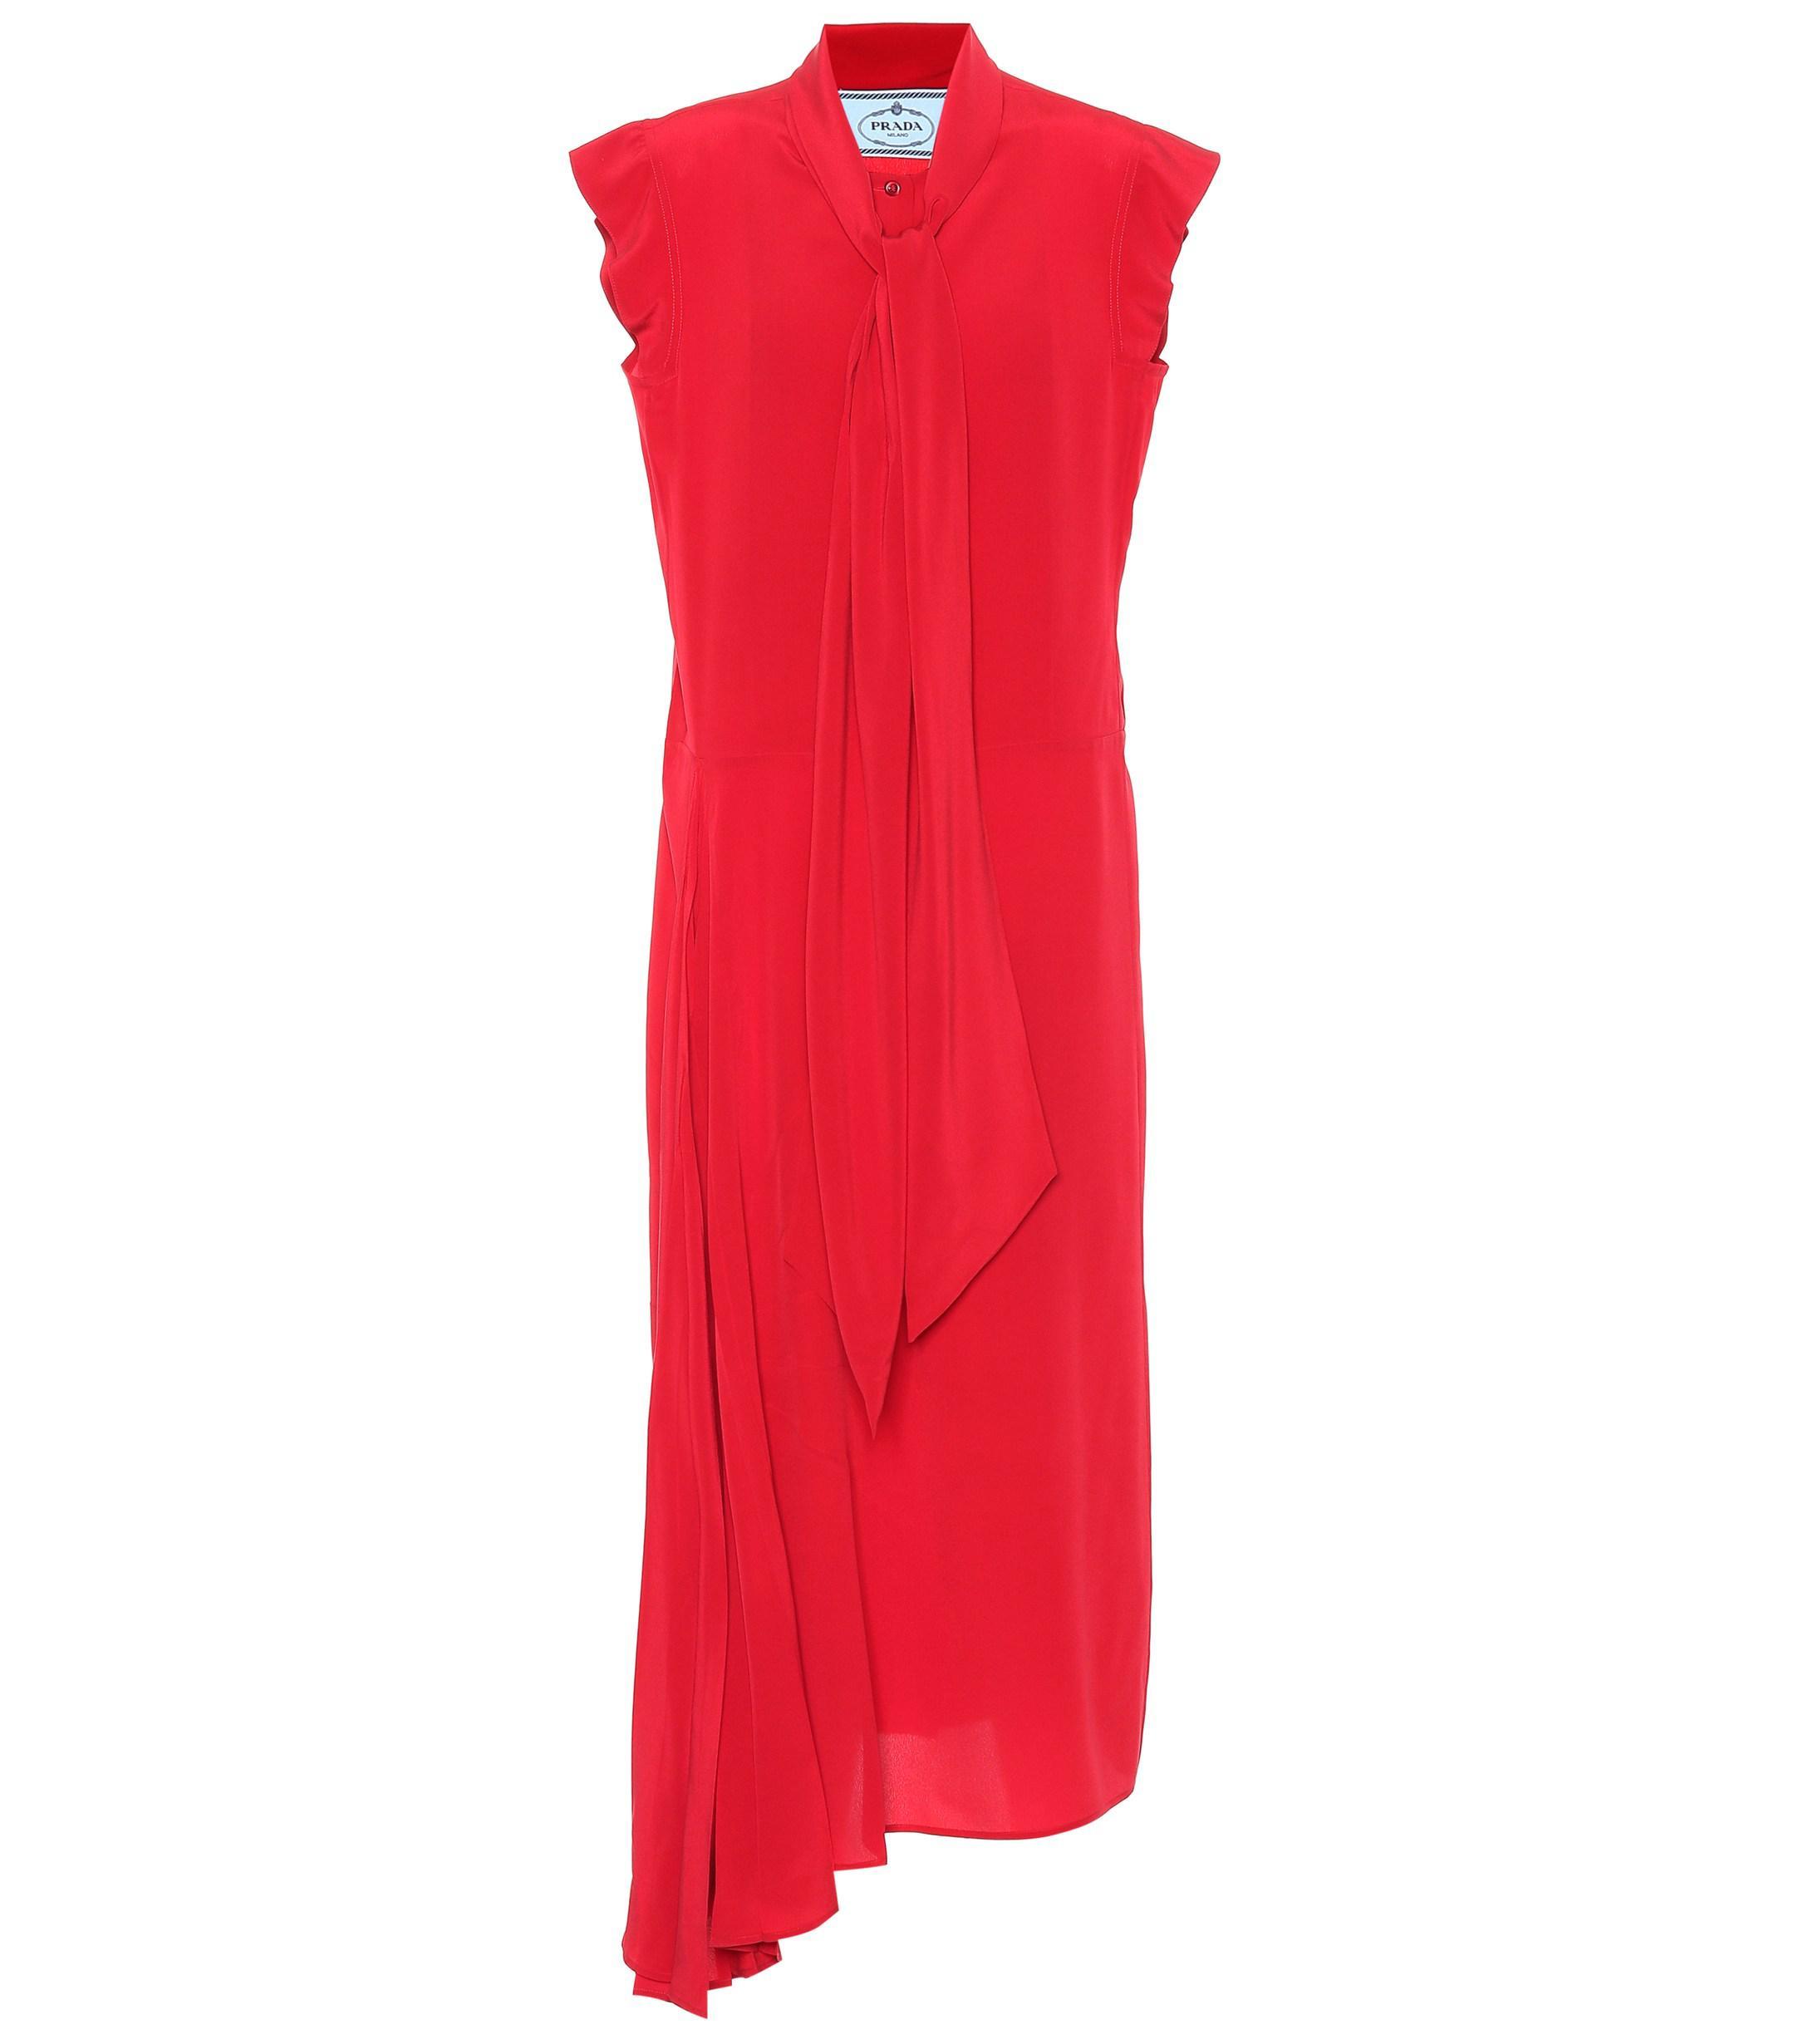 Lyst - Prada Sleeveless Silk Dress in Red d59091bde0